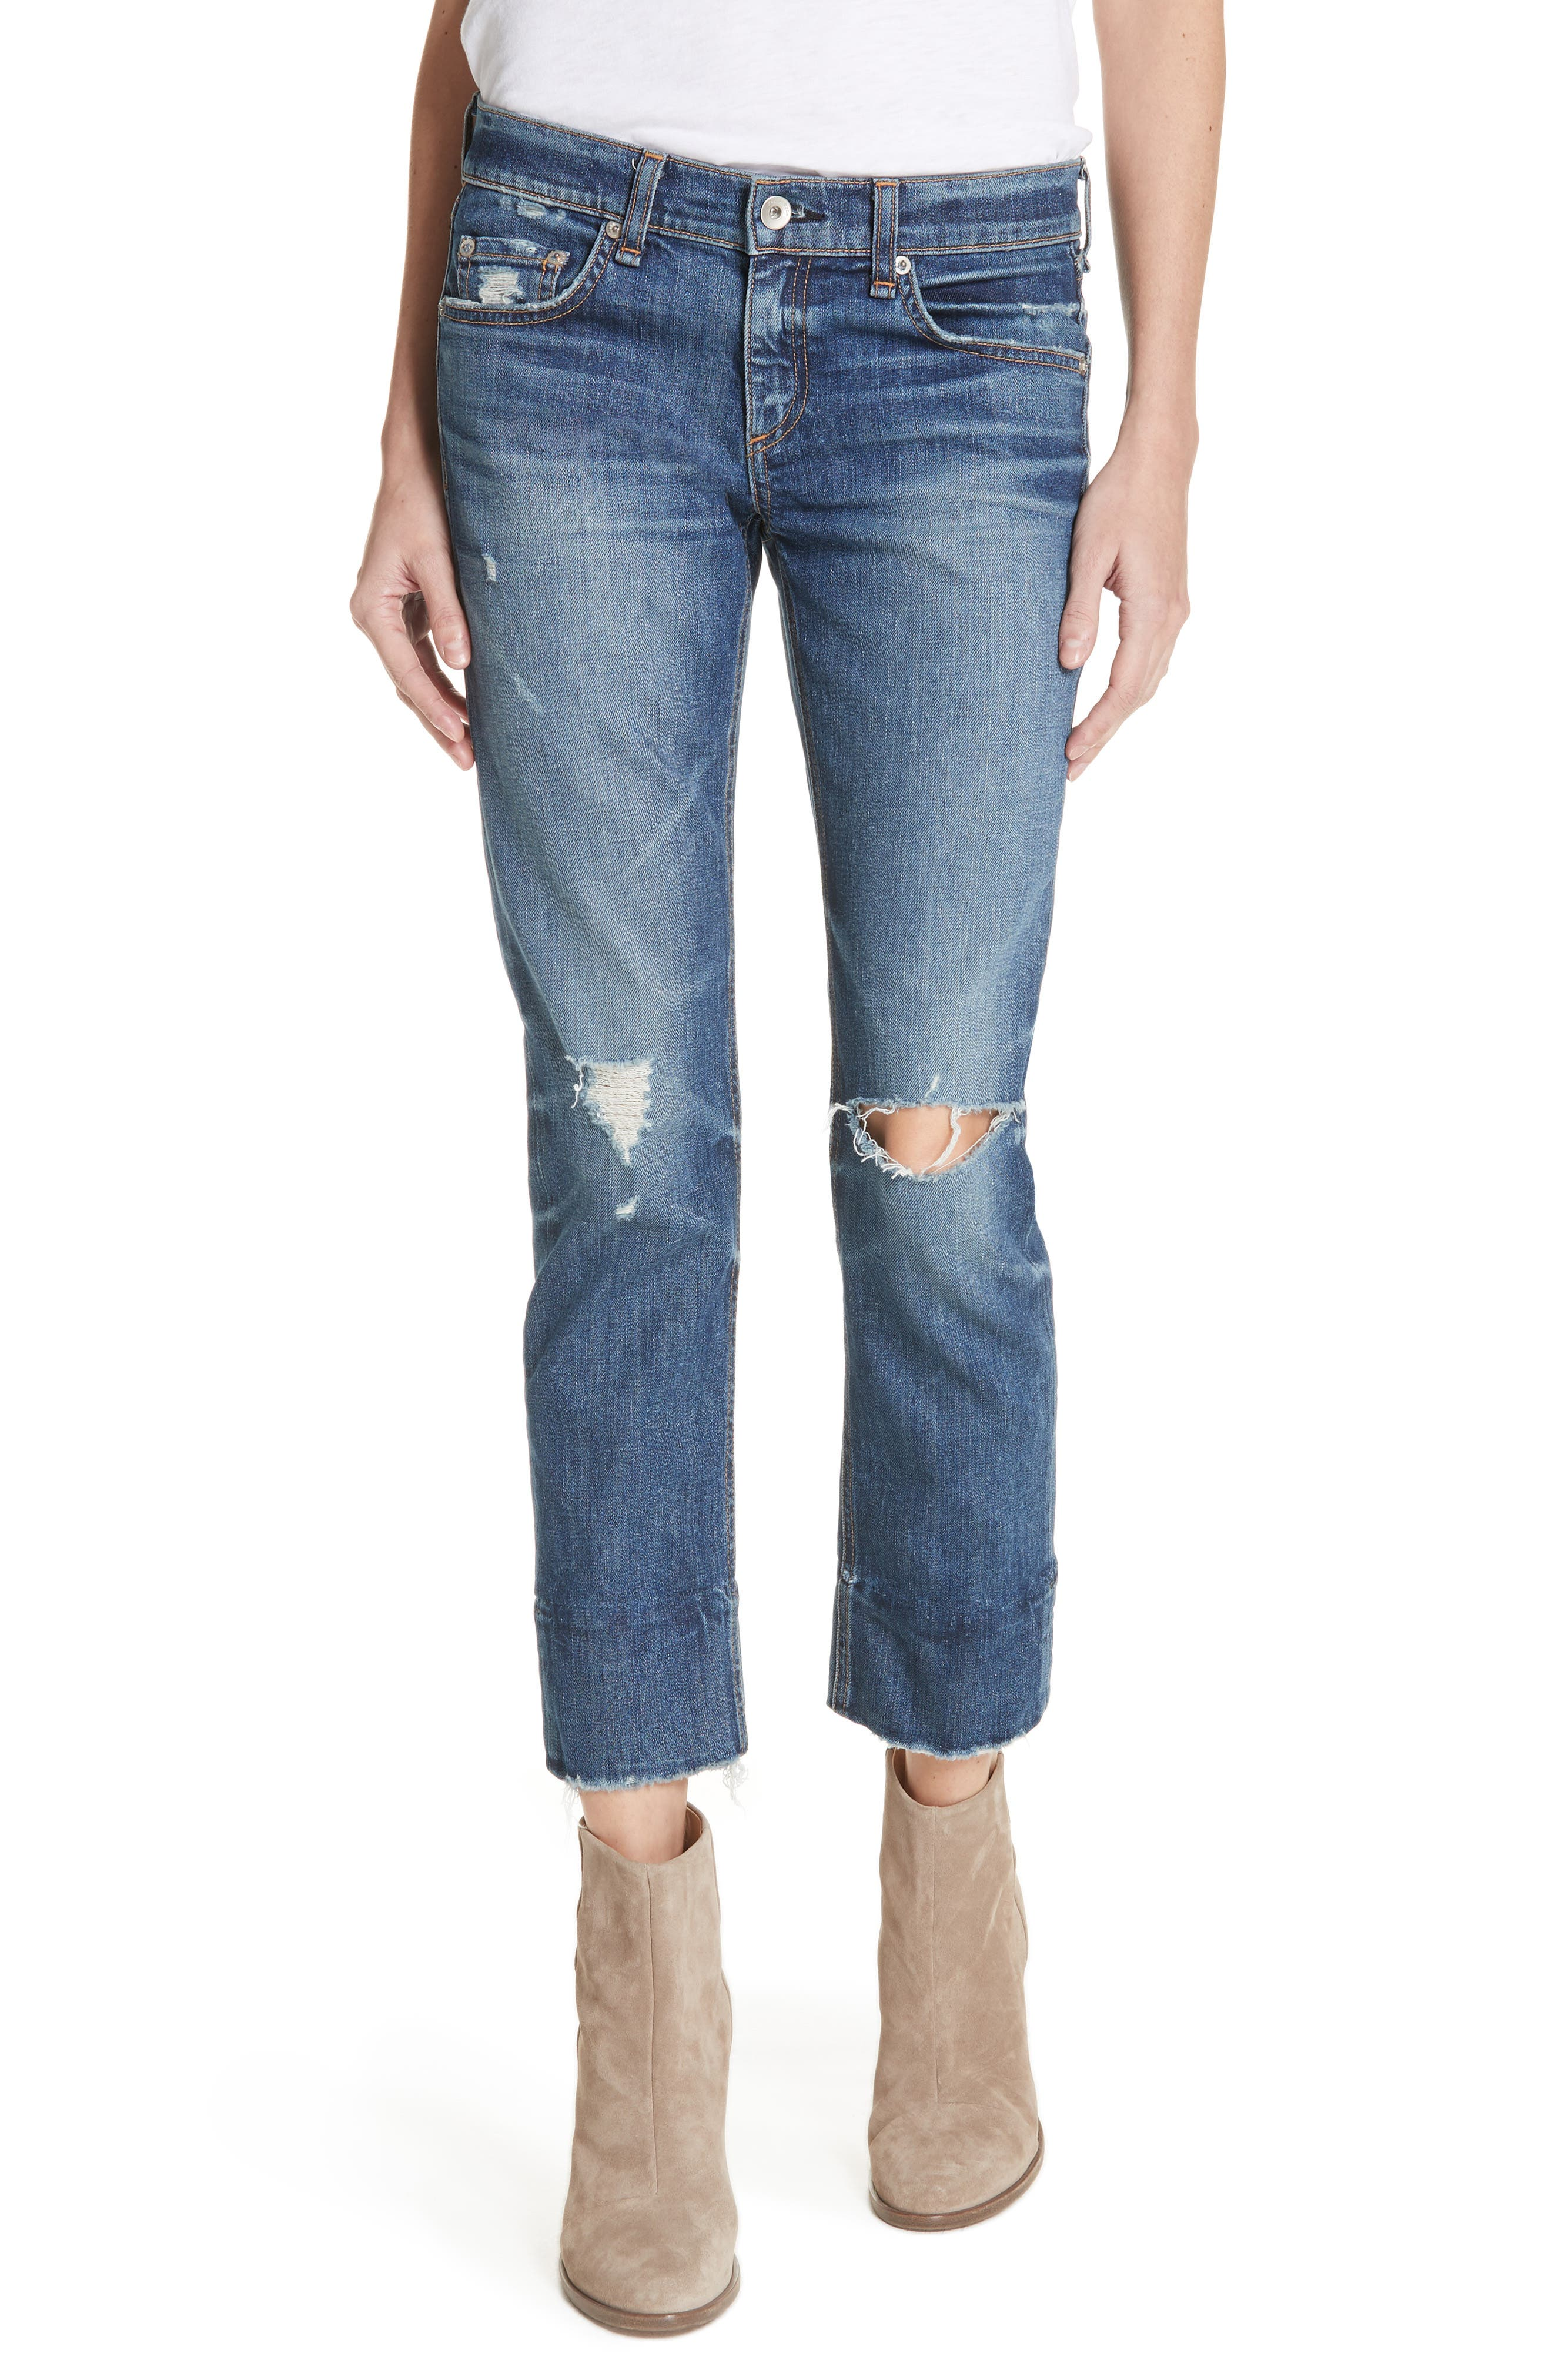 Alternate Image 1 Selected - rag & bone/JEAN Dre Ankle Slim Boyfriend Jeans (Deville)